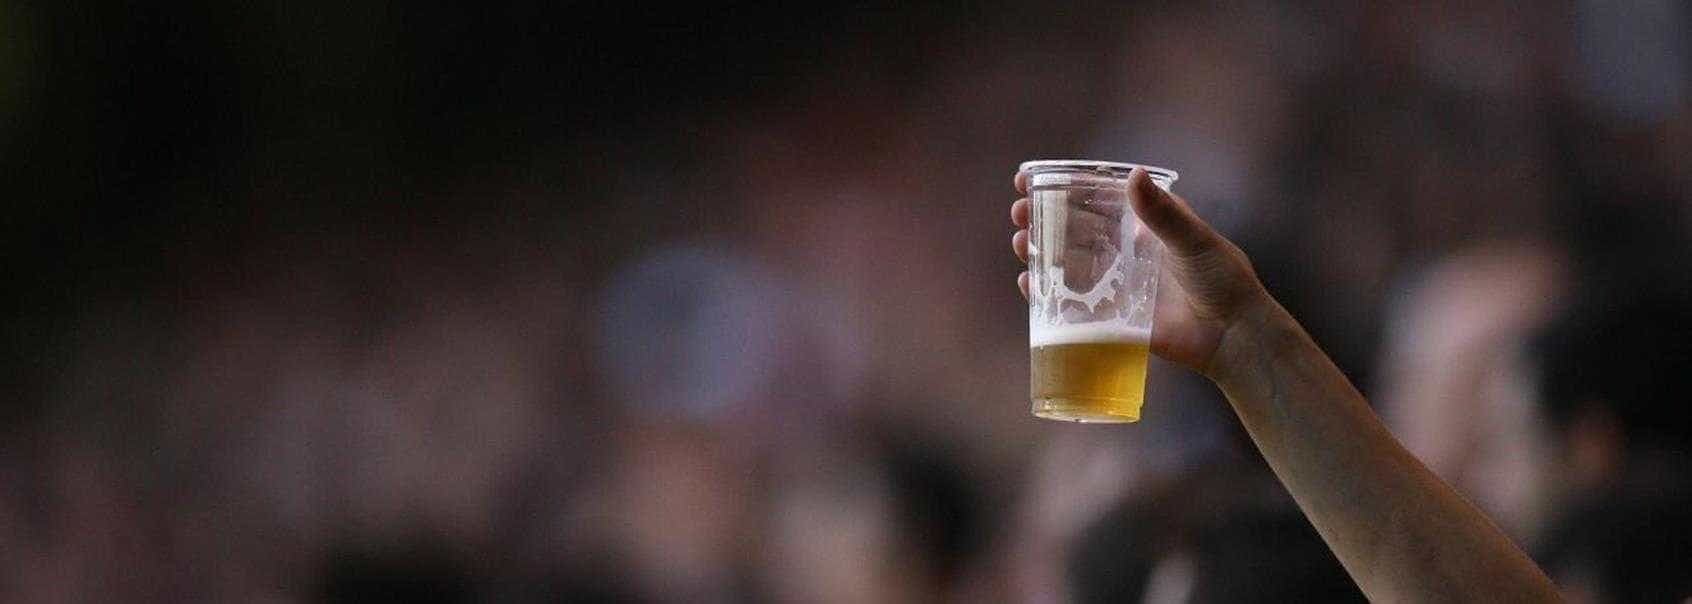 Álcool será restrito nos estádios da Copa América, diz COL